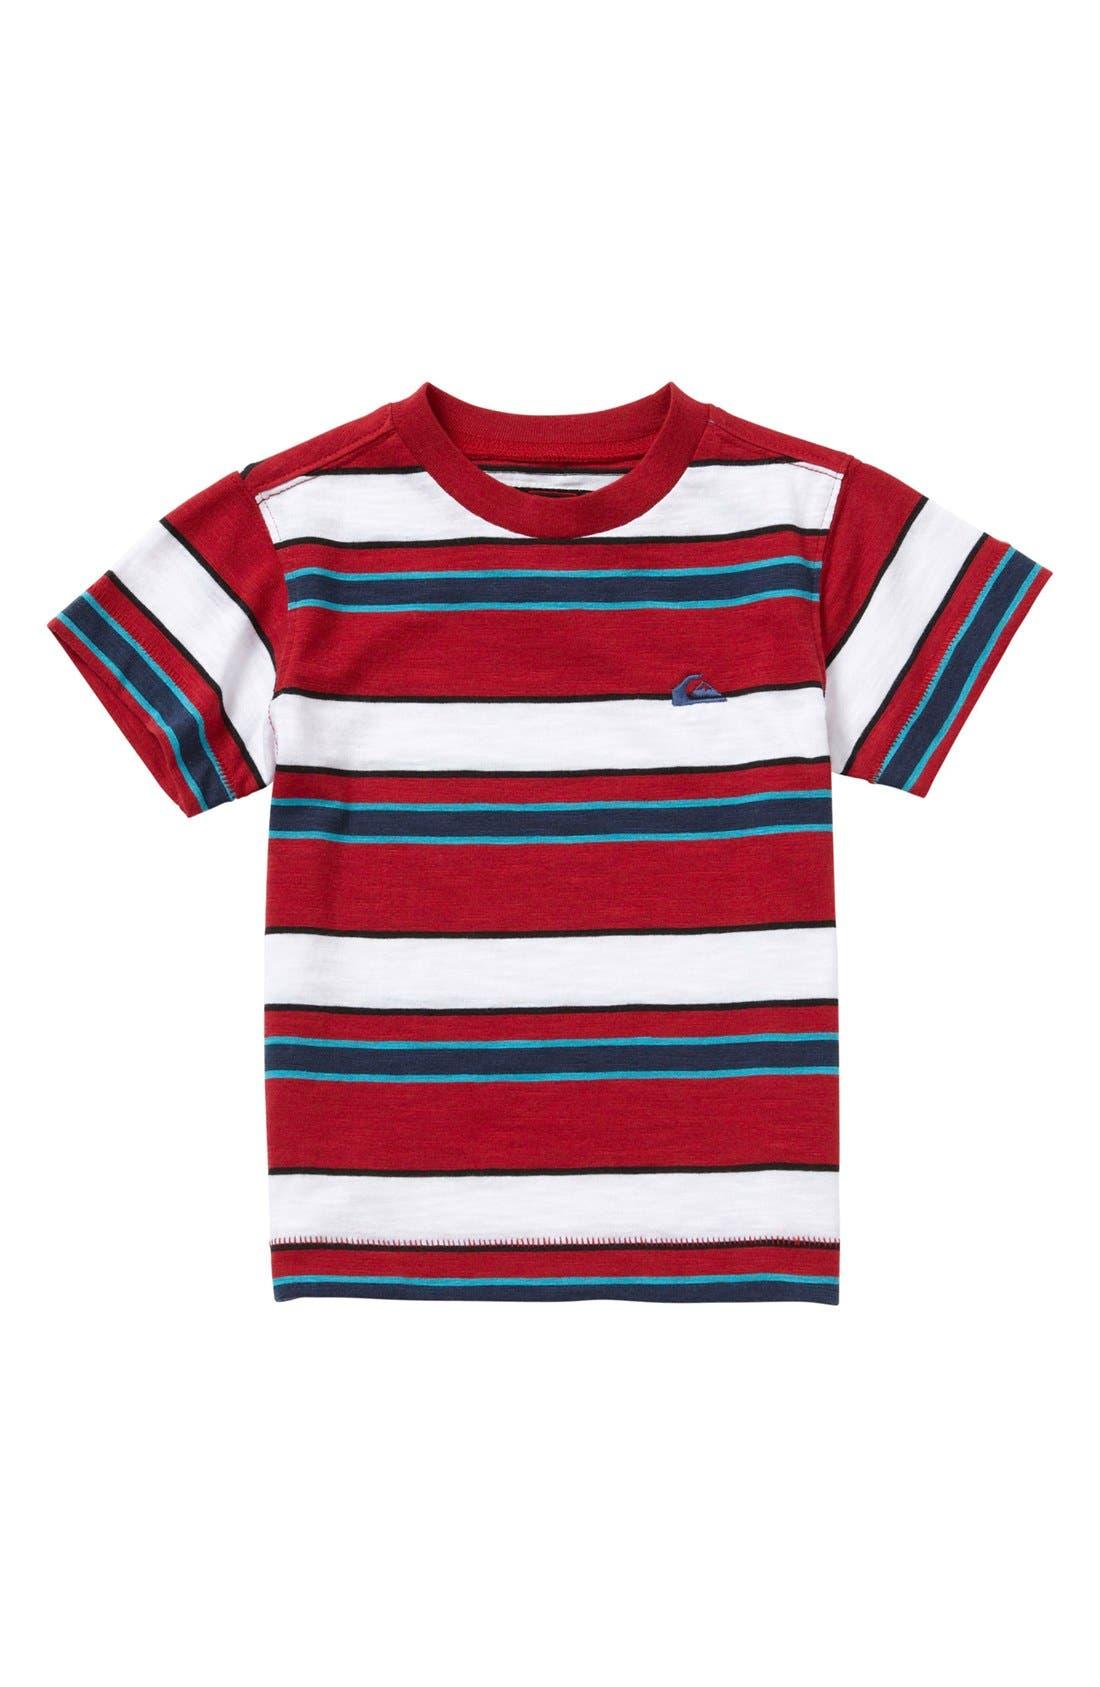 Alternate Image 1 Selected - Quiksilver 'Eld Street' T-Shirt (Baby Boys)